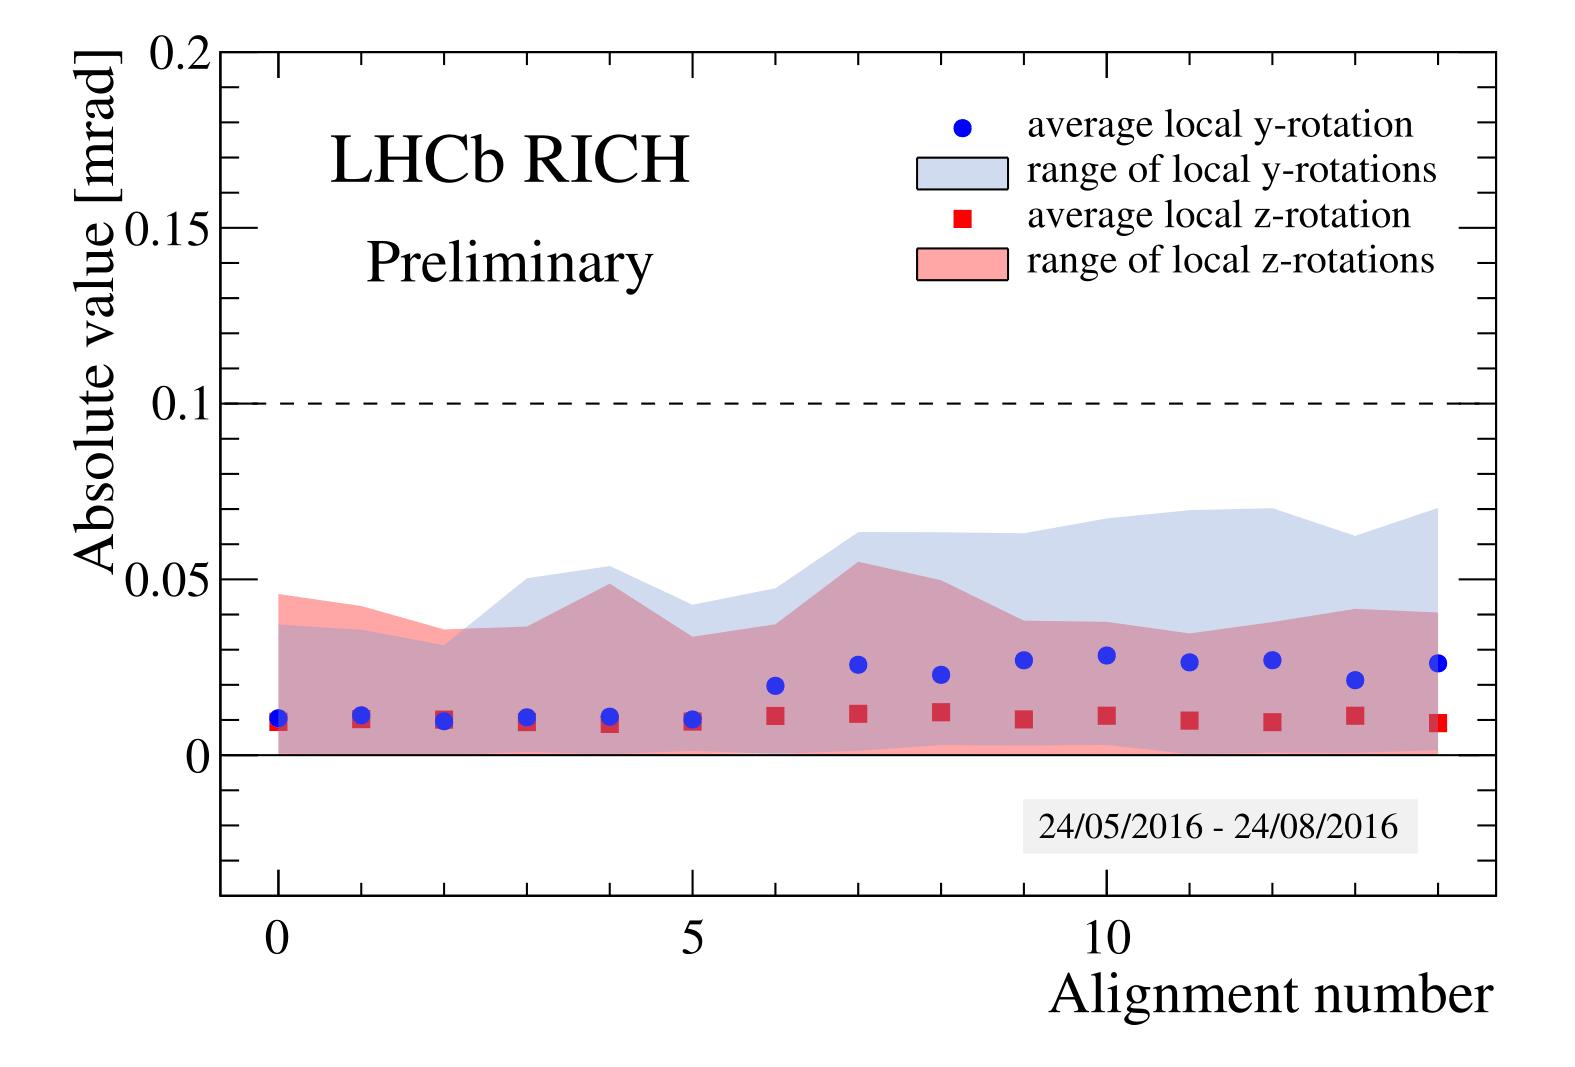 Rich2_absav_range.1-1.png